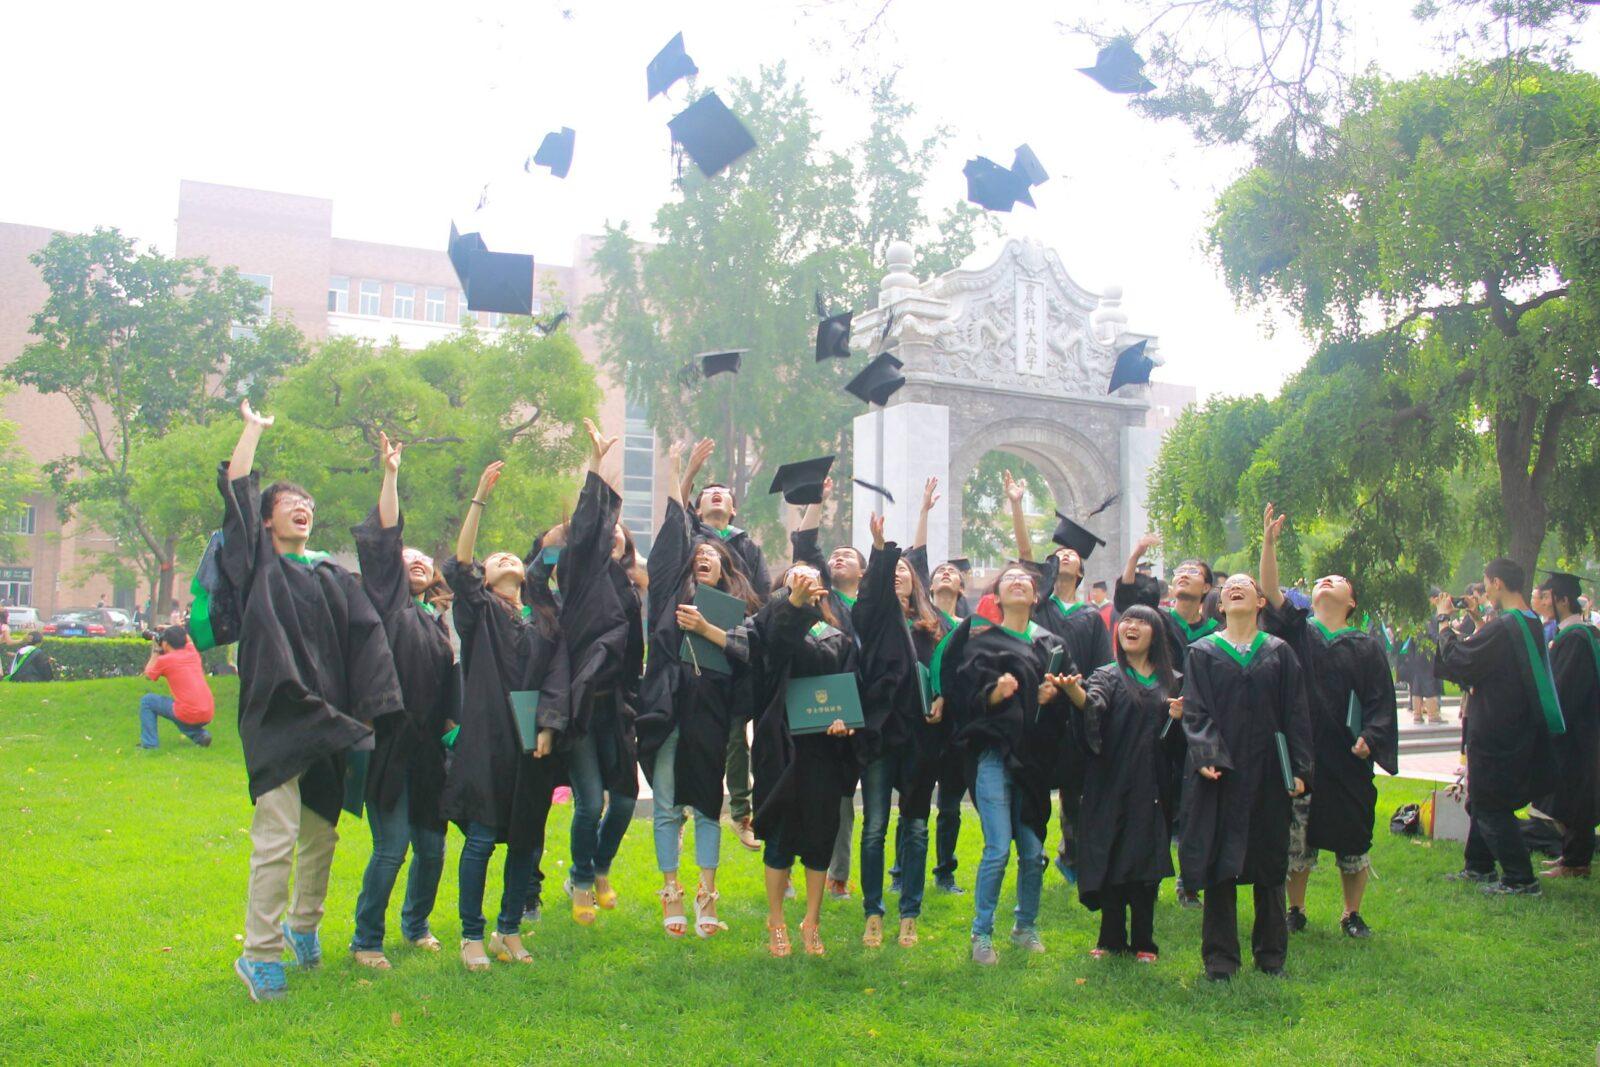 China University of Geosciences (Beijing) graduates